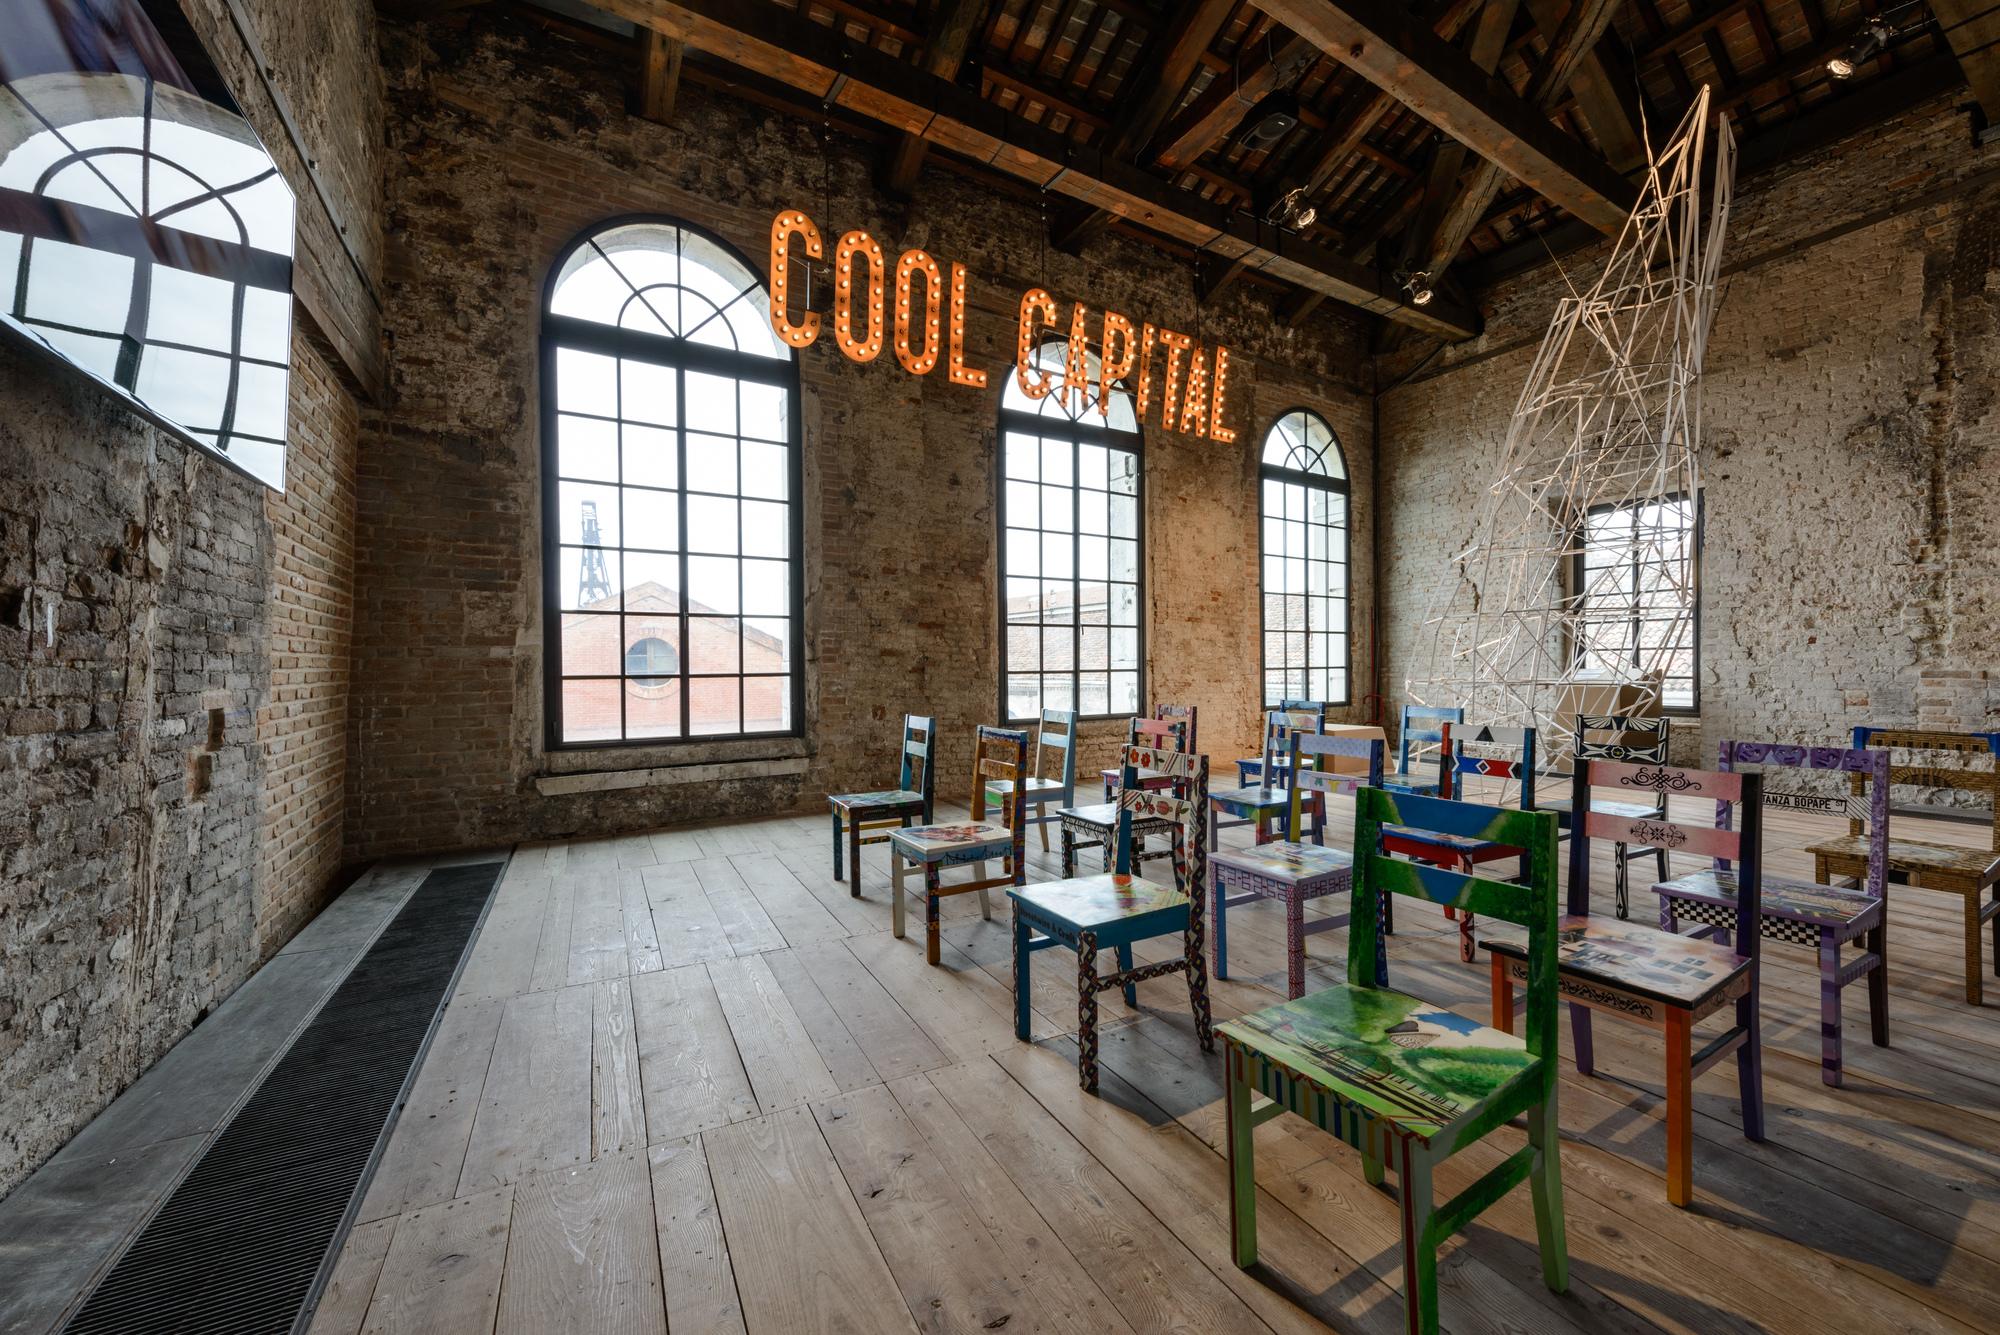 Cool Capital Inside South Africas Pavilion At The 2016 Venice Biennale C Andrea Avezzu